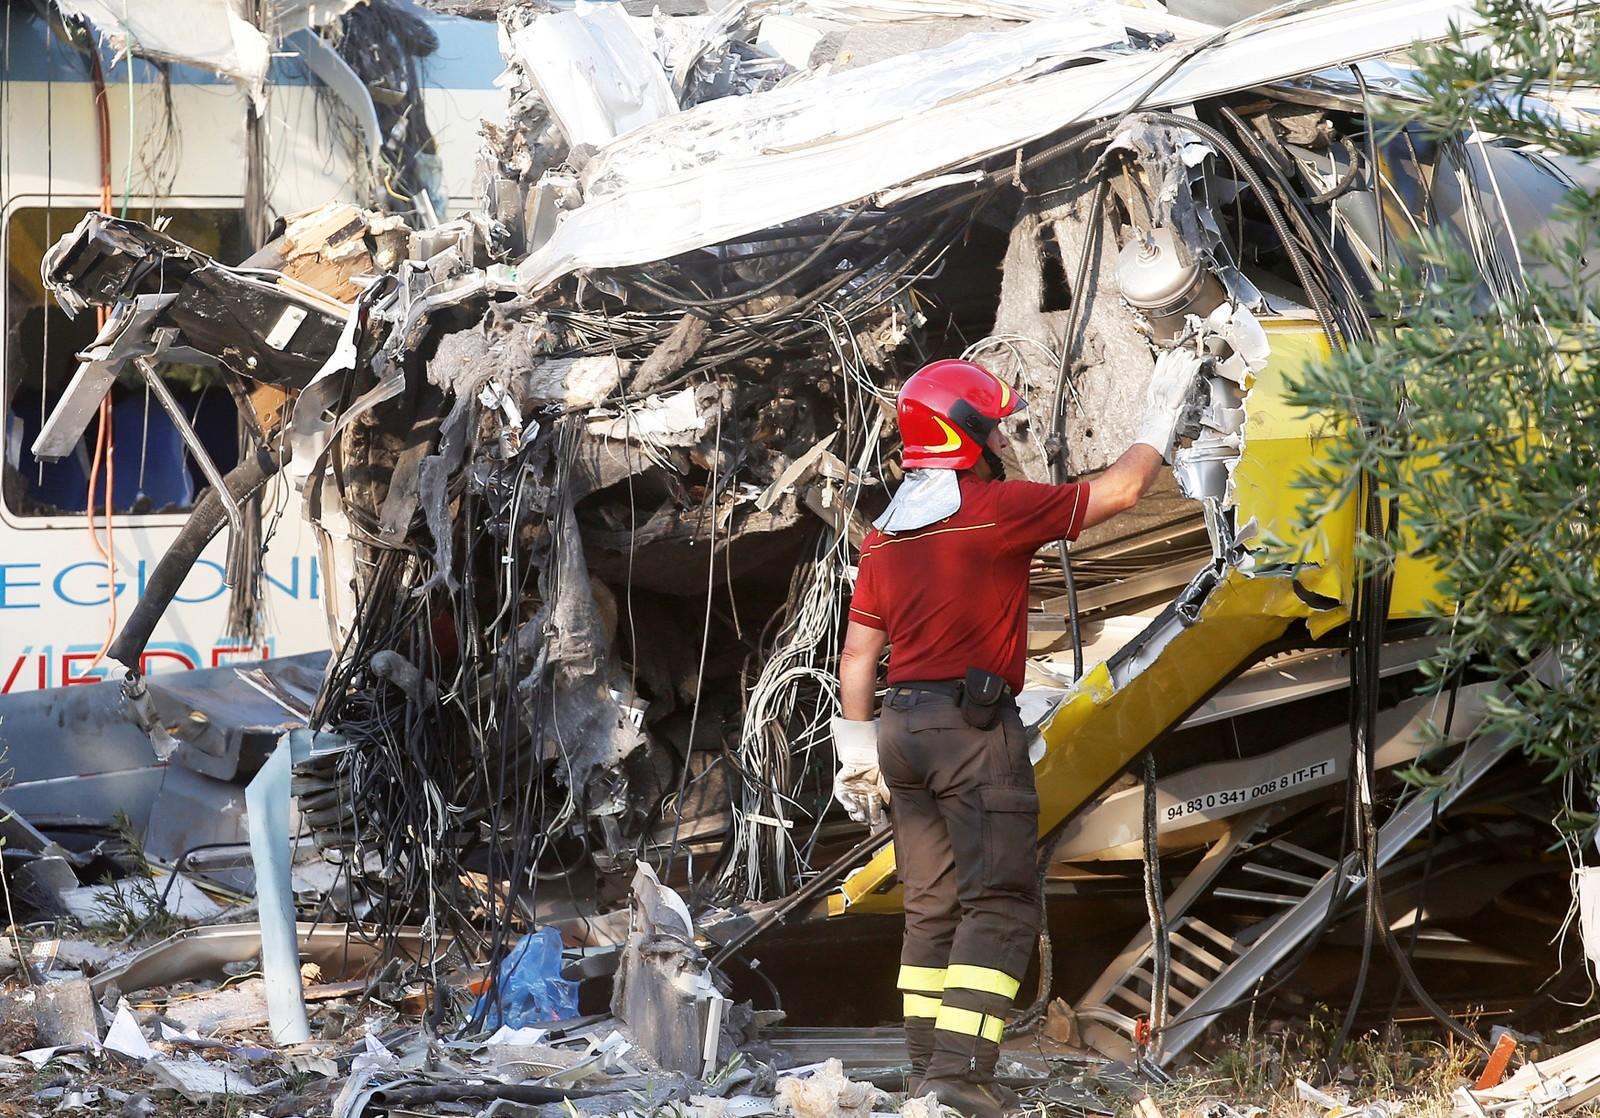 Redningsarbeid etter togulykke i Italia